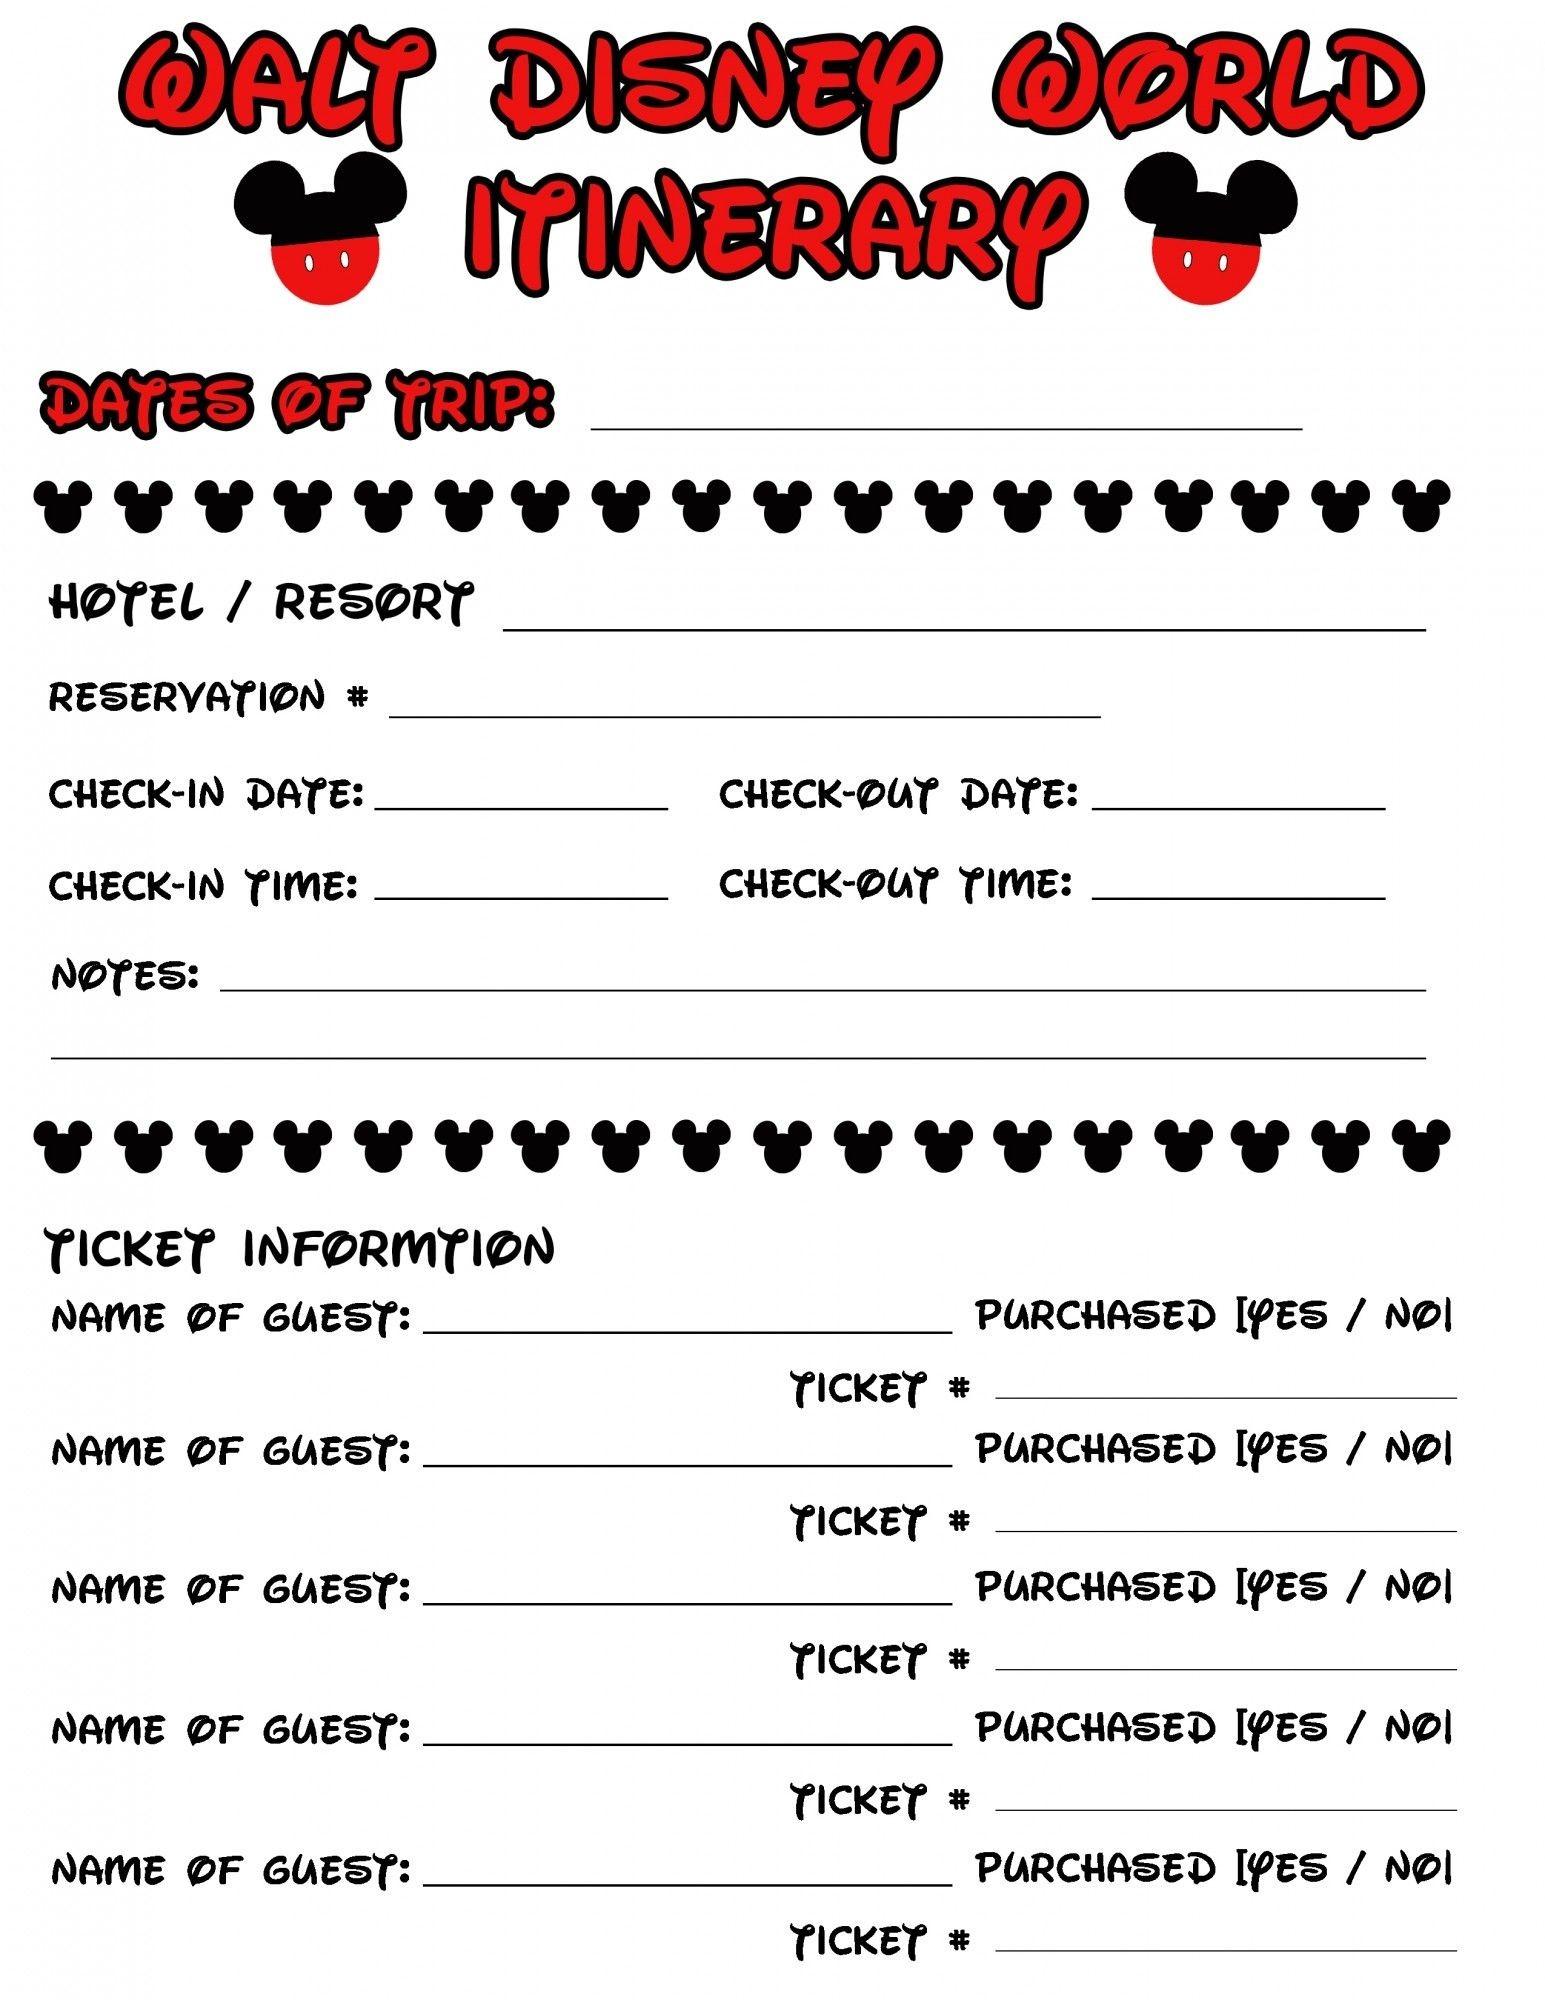 Disney Agenda & Itinerary Free Printable | Disney Vacation-Free Printable Disney Itinerary Template